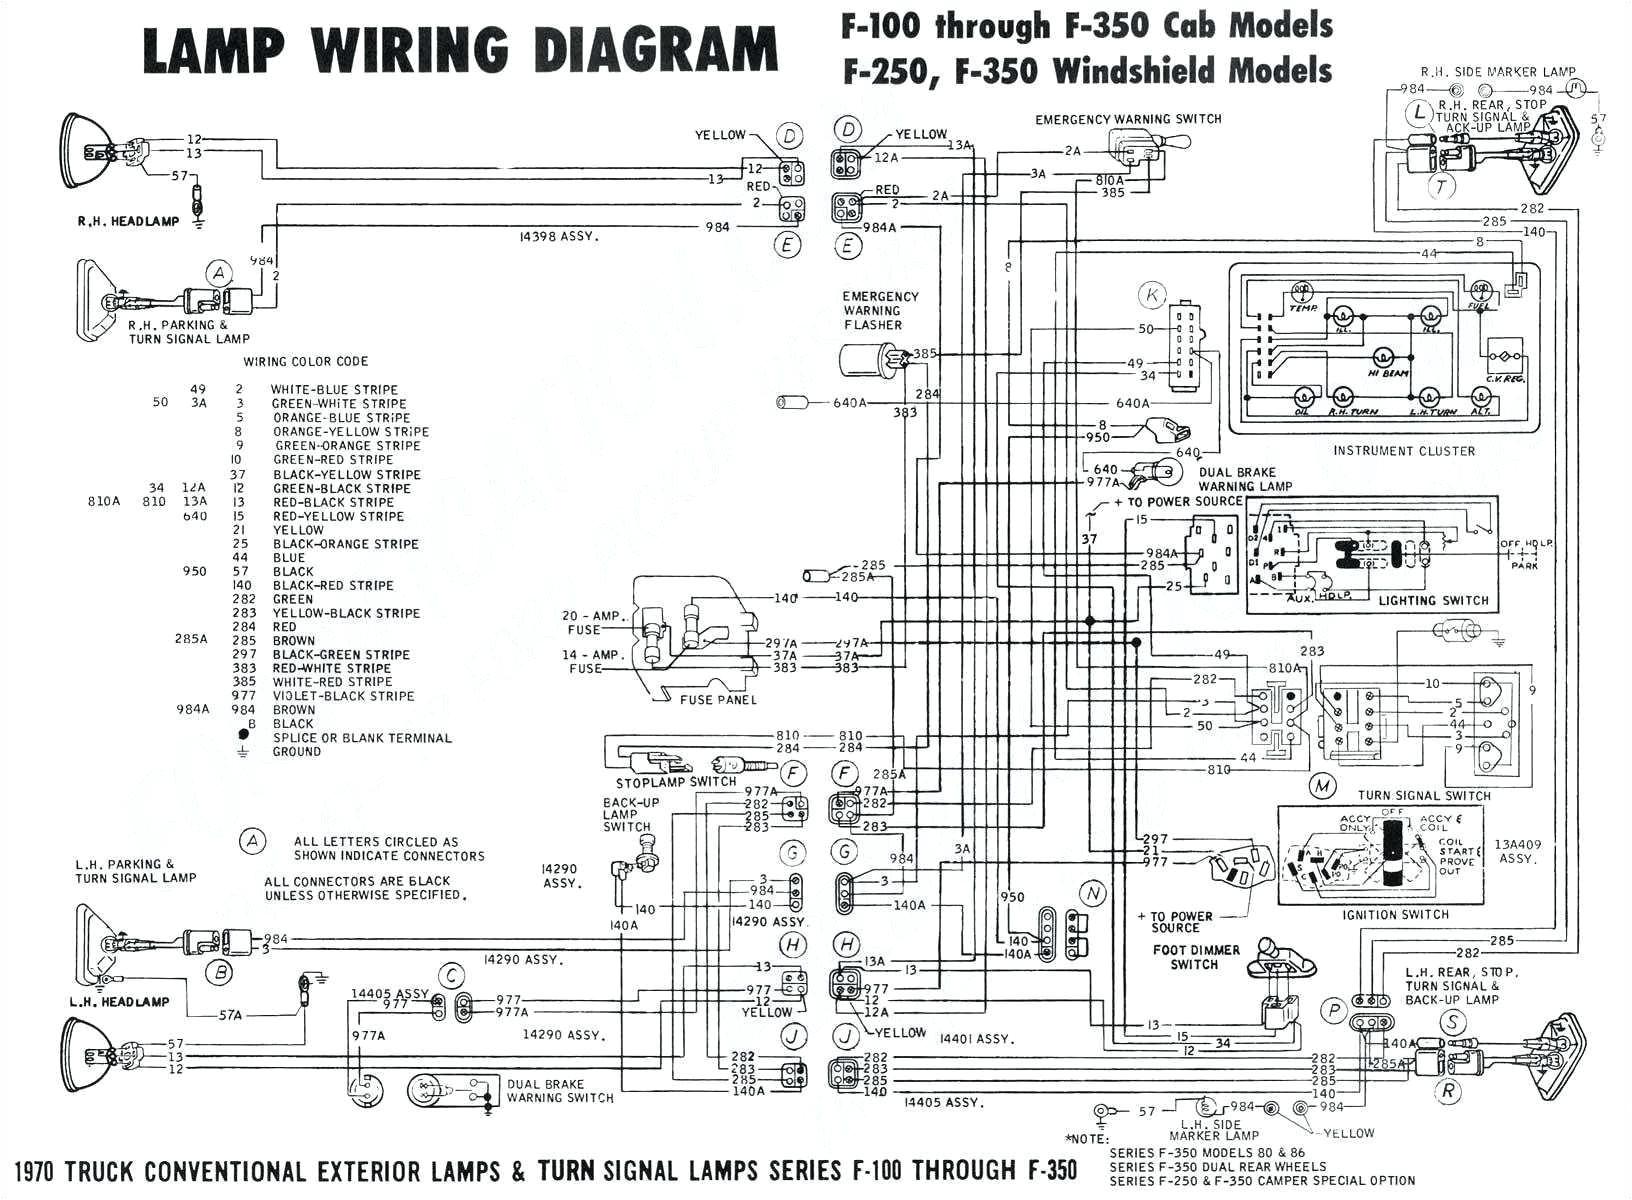 cruise control wiring diagram chevrolet 2000 jetta cruise control wiring diagram free download wiring of cruise control wiring diagram chevrolet jpg